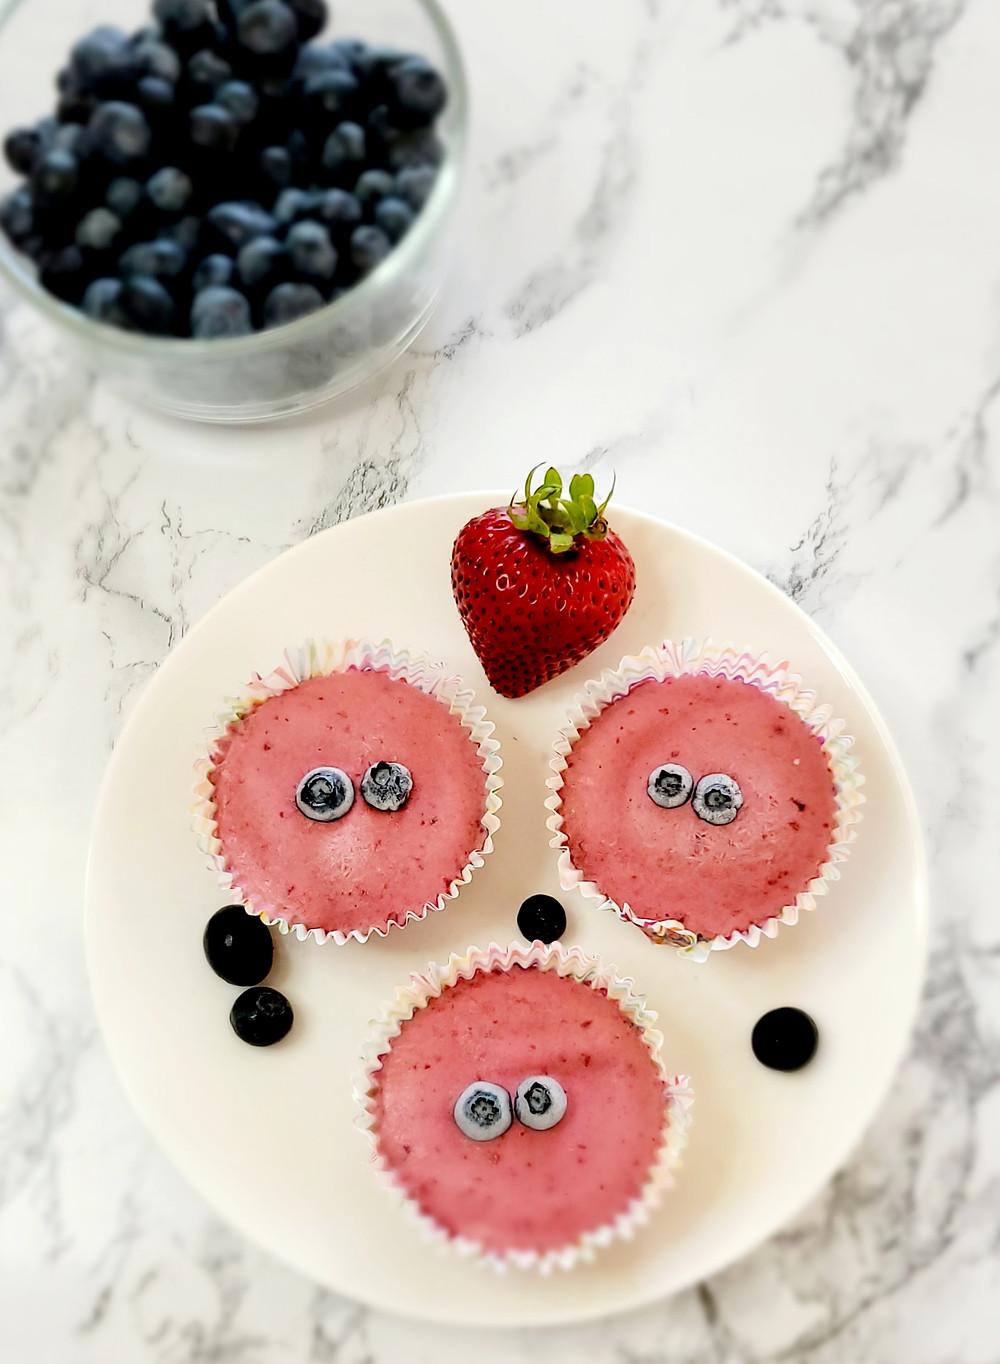 Fruity Fro-Yo Mini Tarts made with Greek yogurt